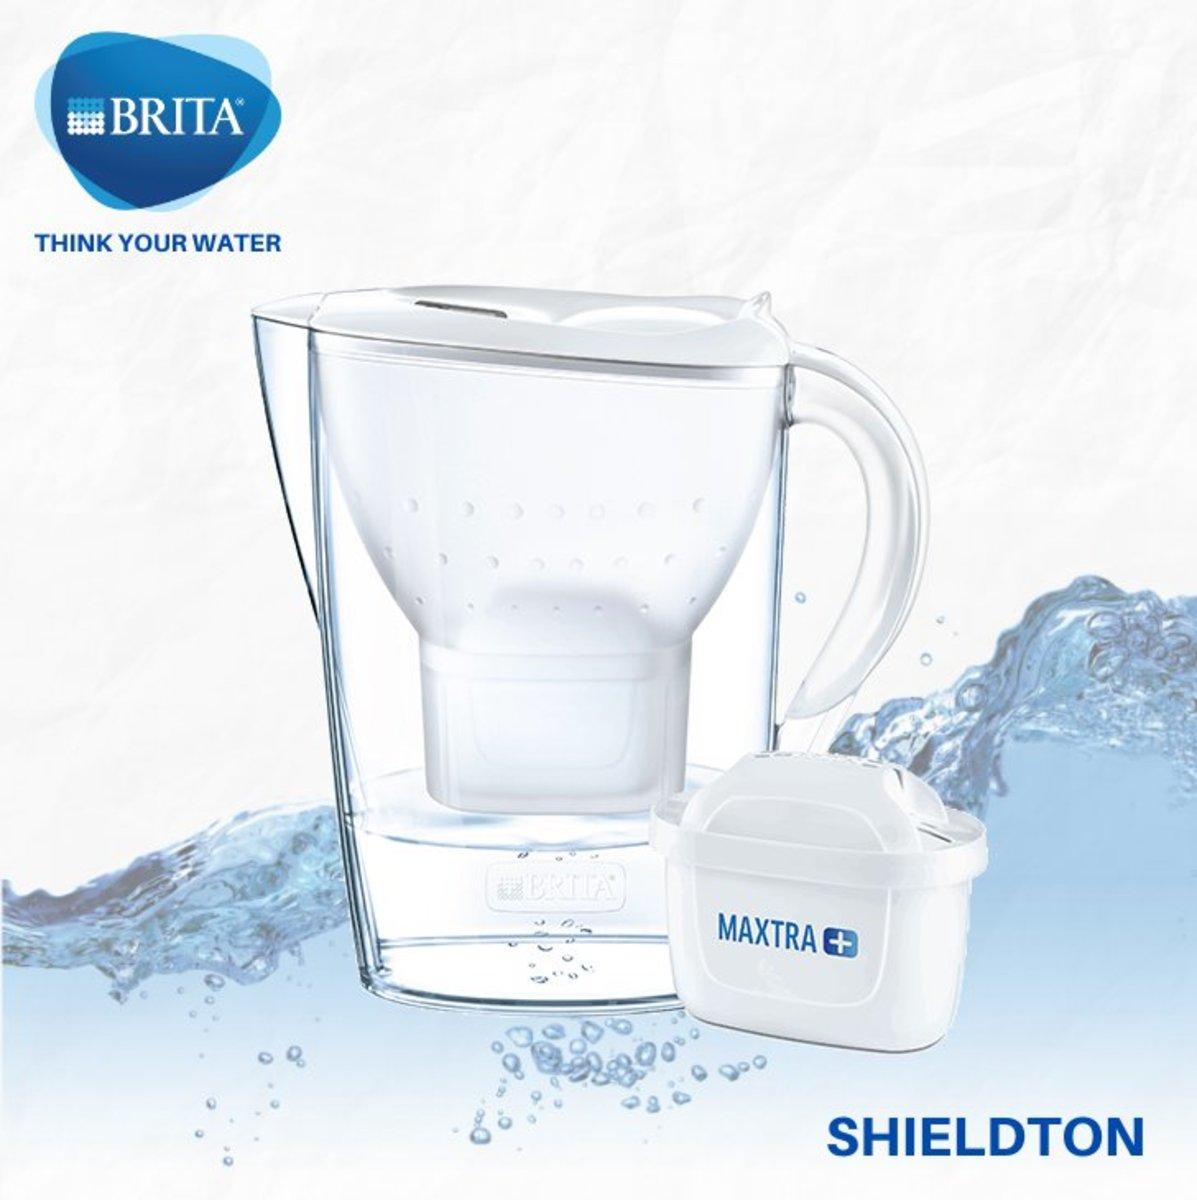 Marella XL 3.5L water filter jug (white)